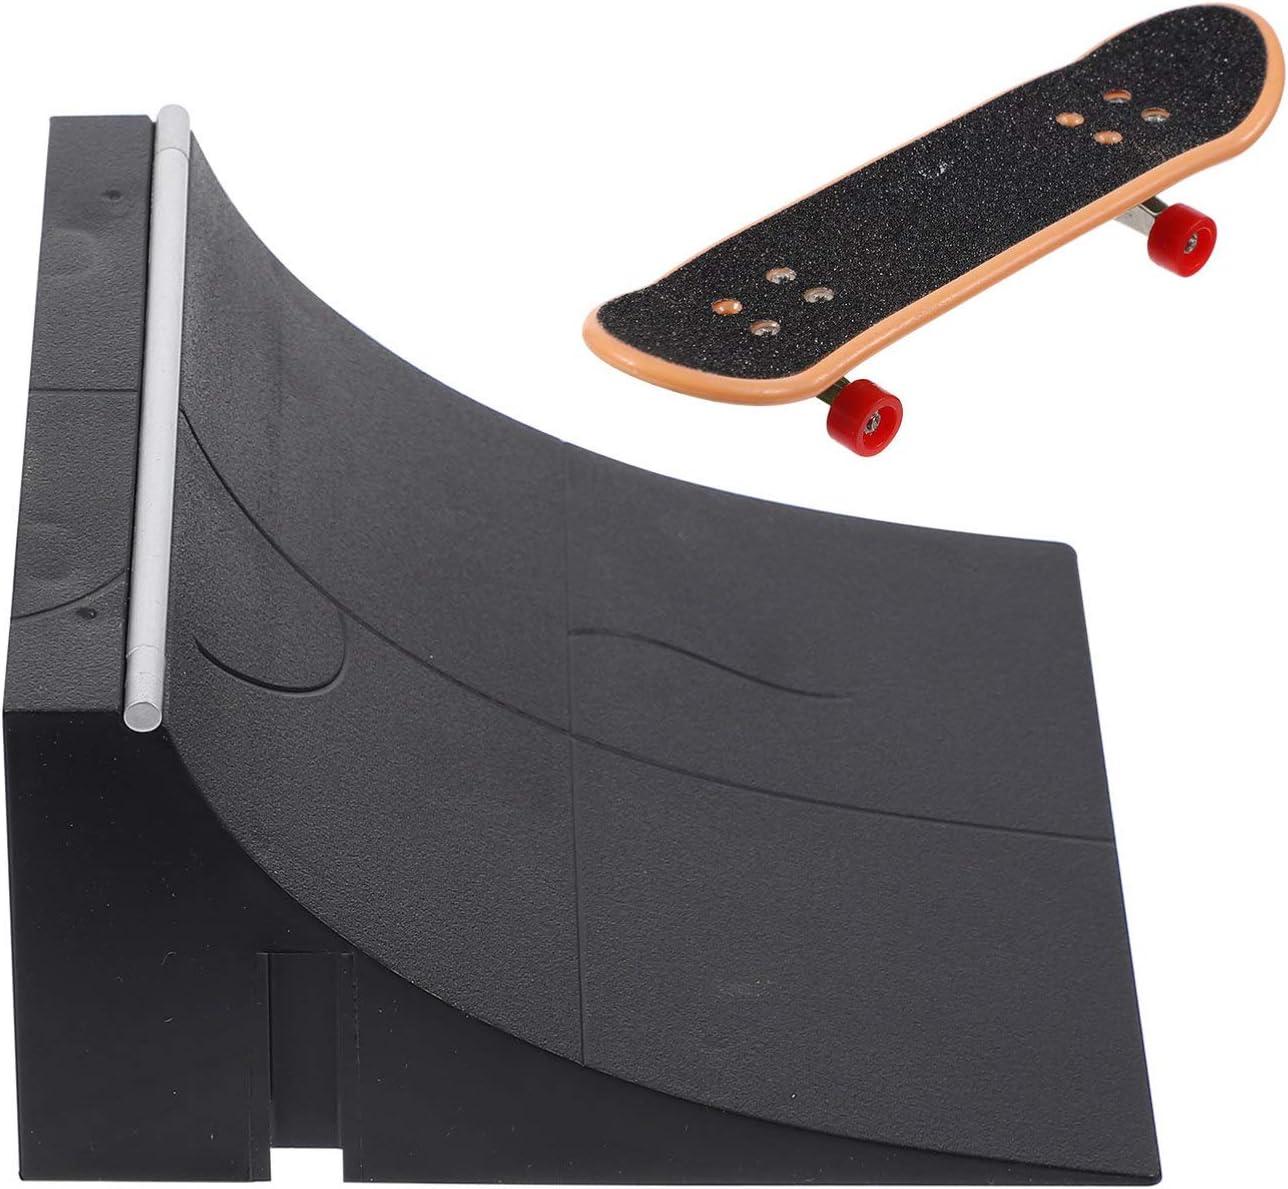 Toyvian Mini Fingerboard Skate Park Product for Skateb Ramp discount Parts Finger